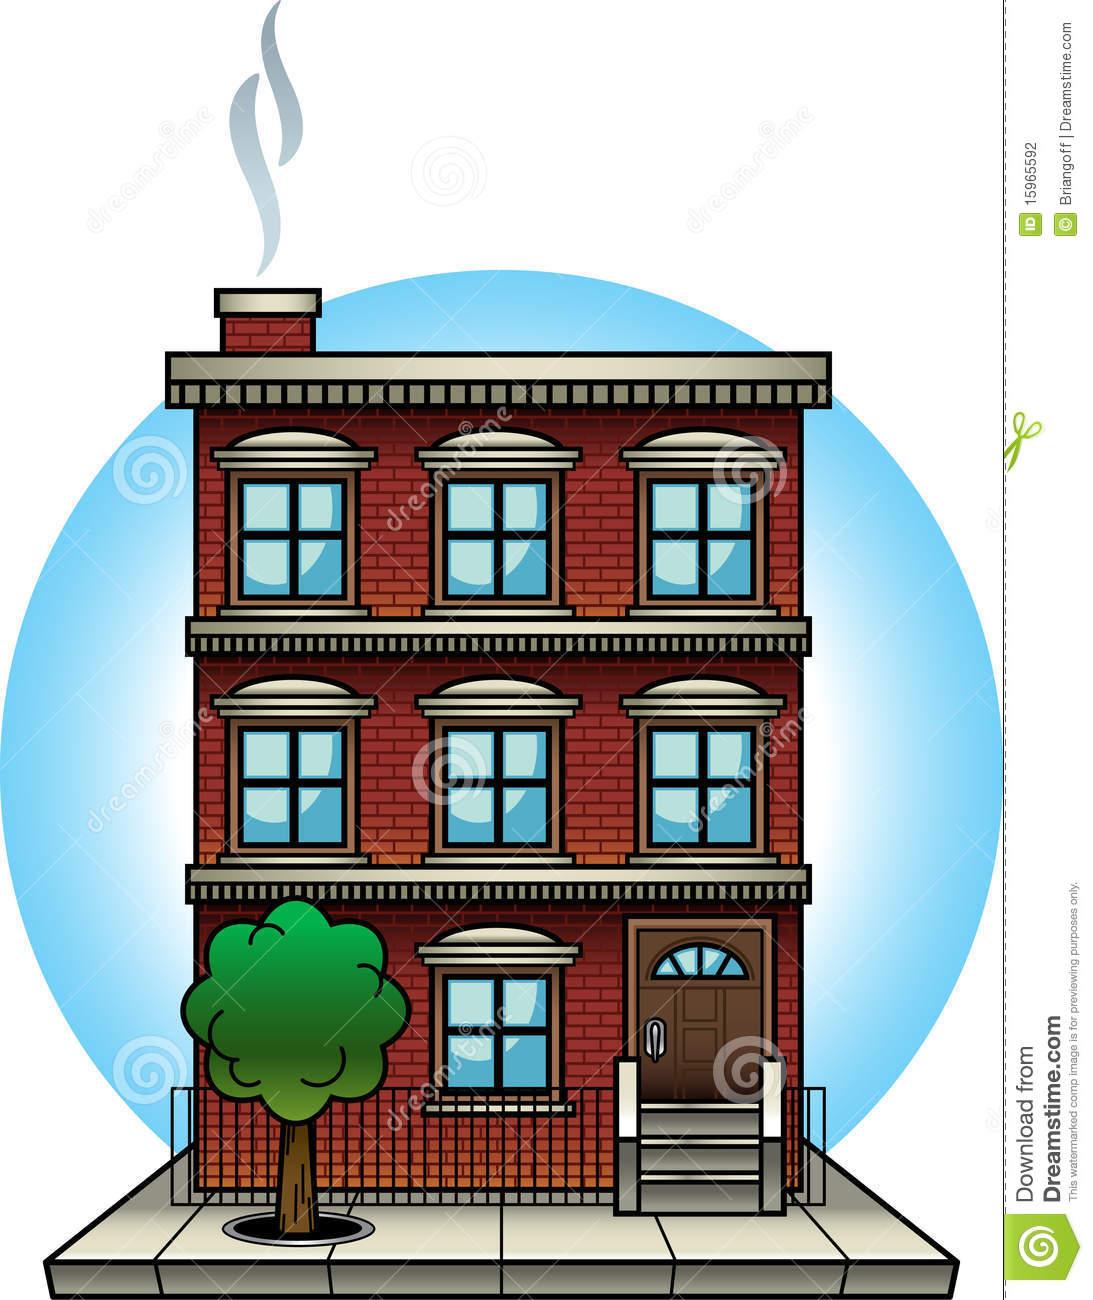 Apartment Clipart at GetDrawings.com.